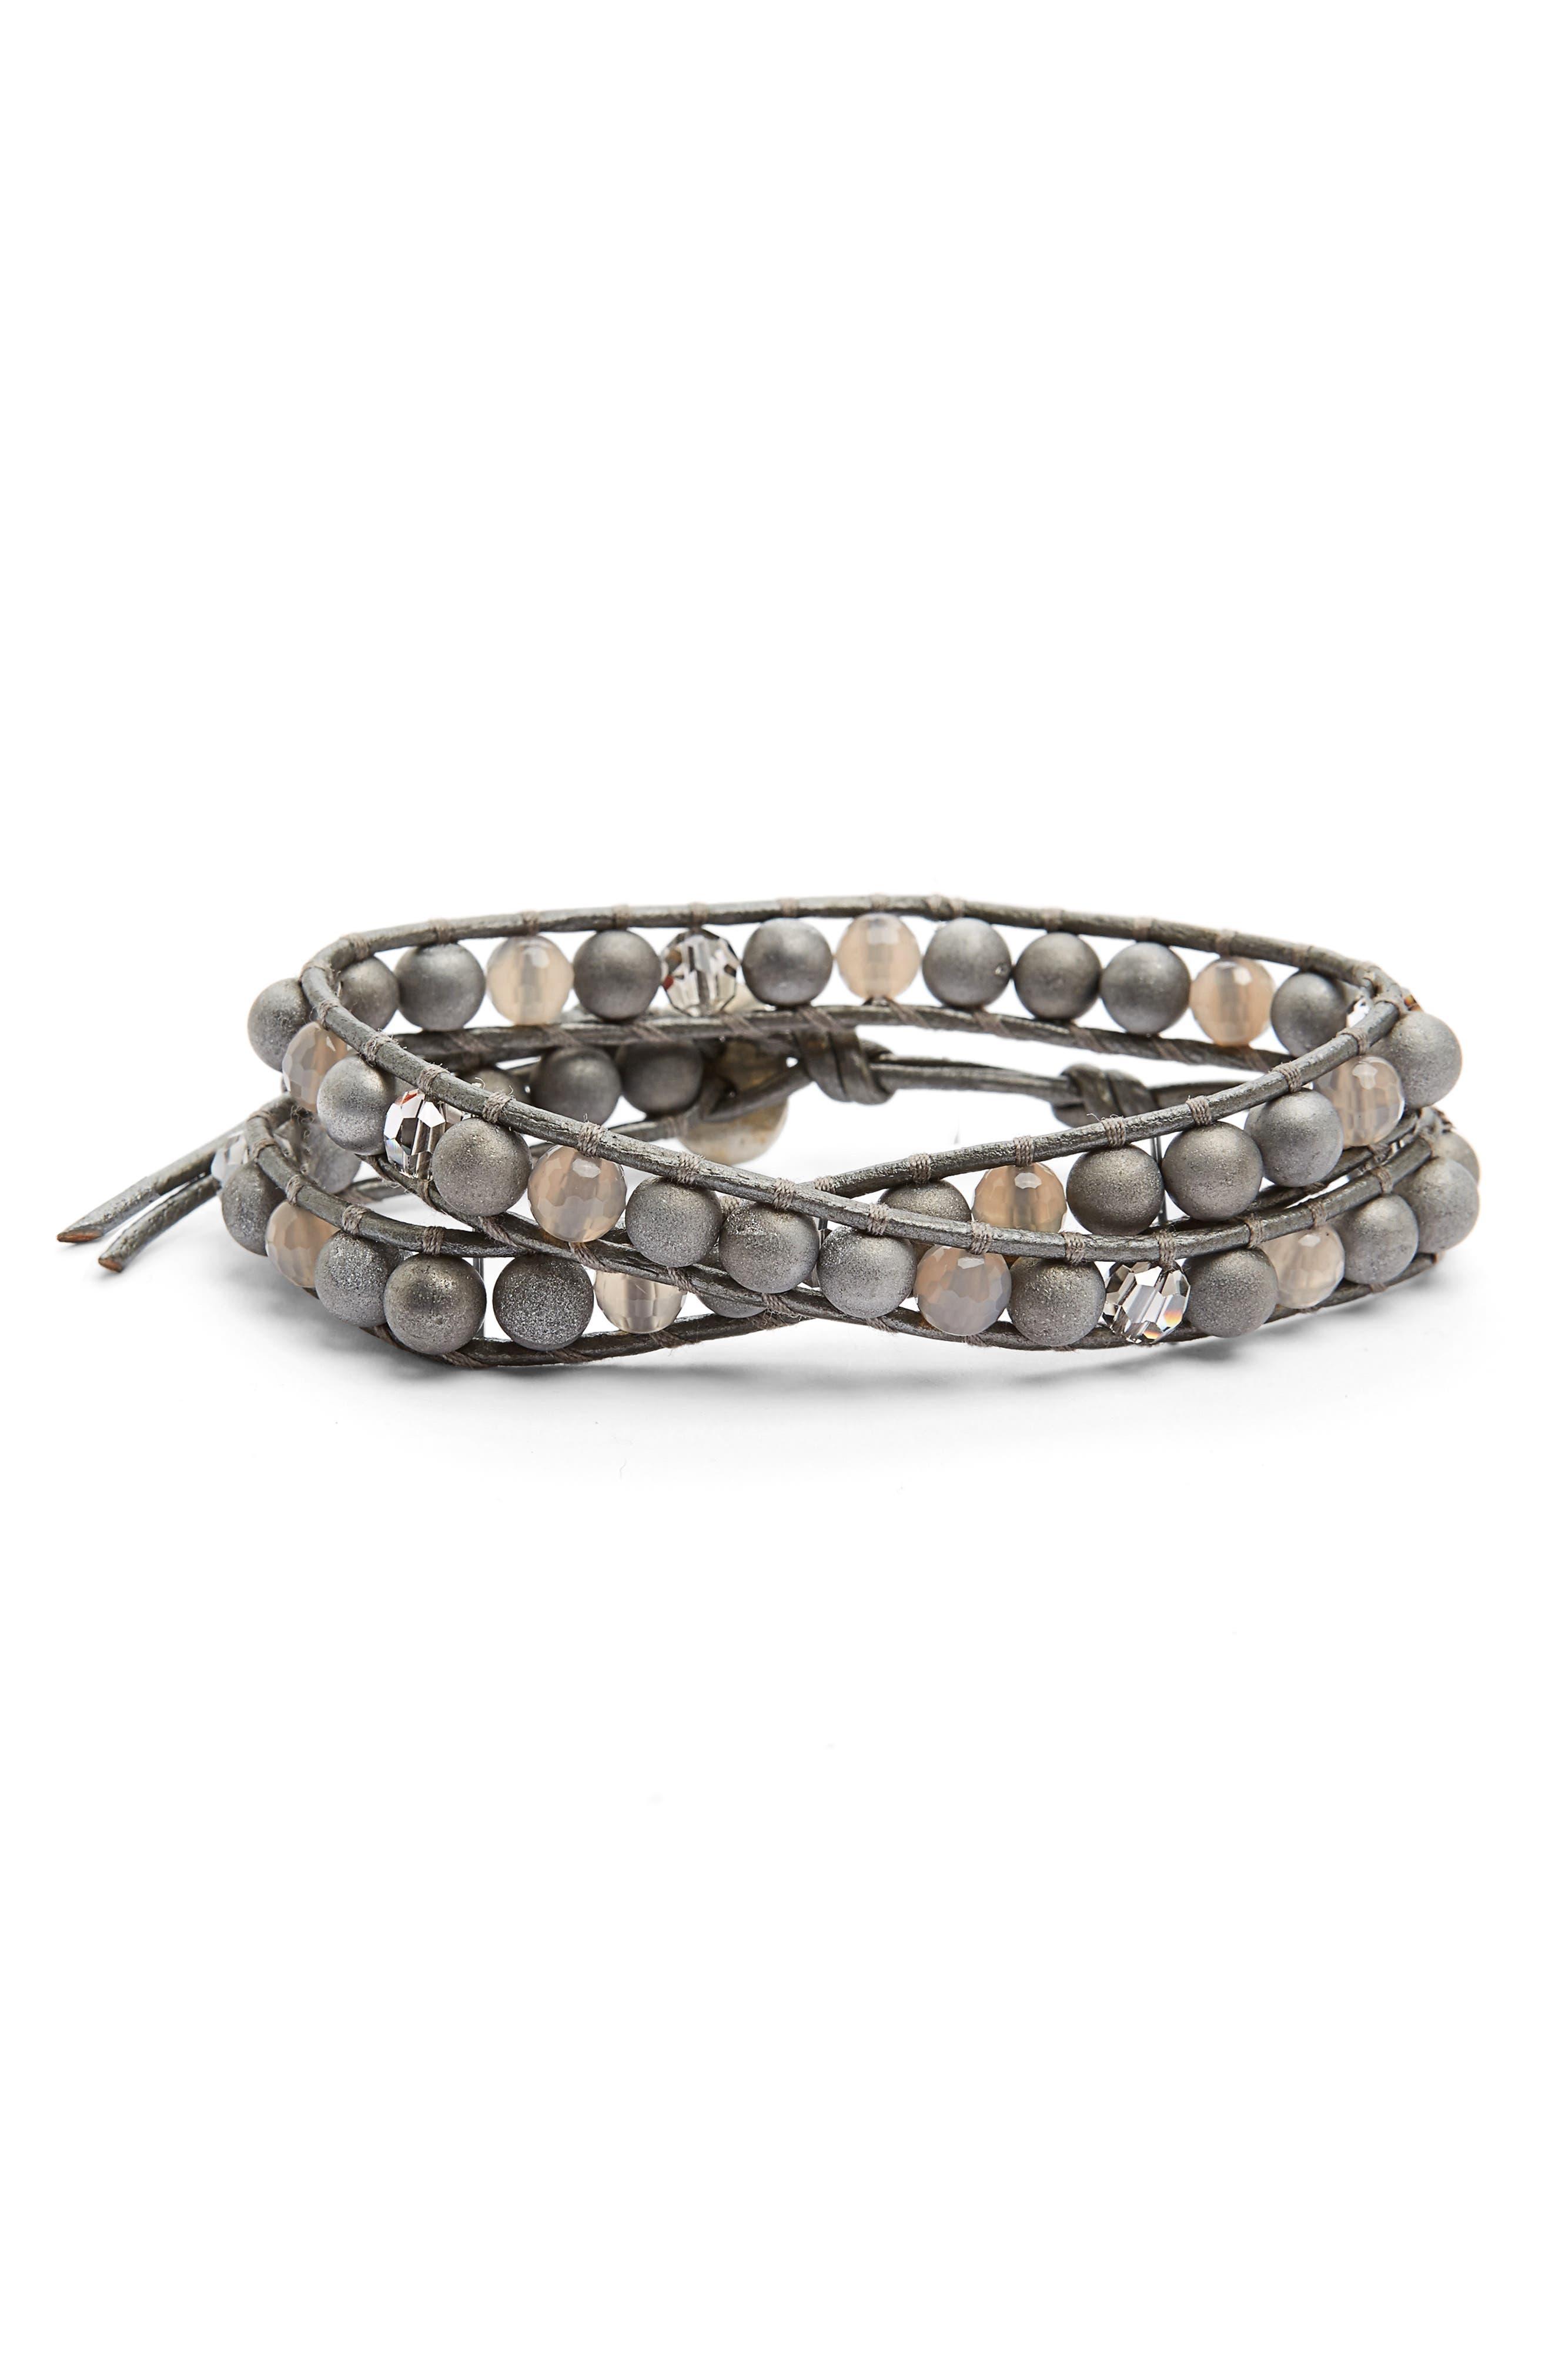 Silver Agate & Crystal Wrap Bracelet,                         Main,                         color, Silver Agate